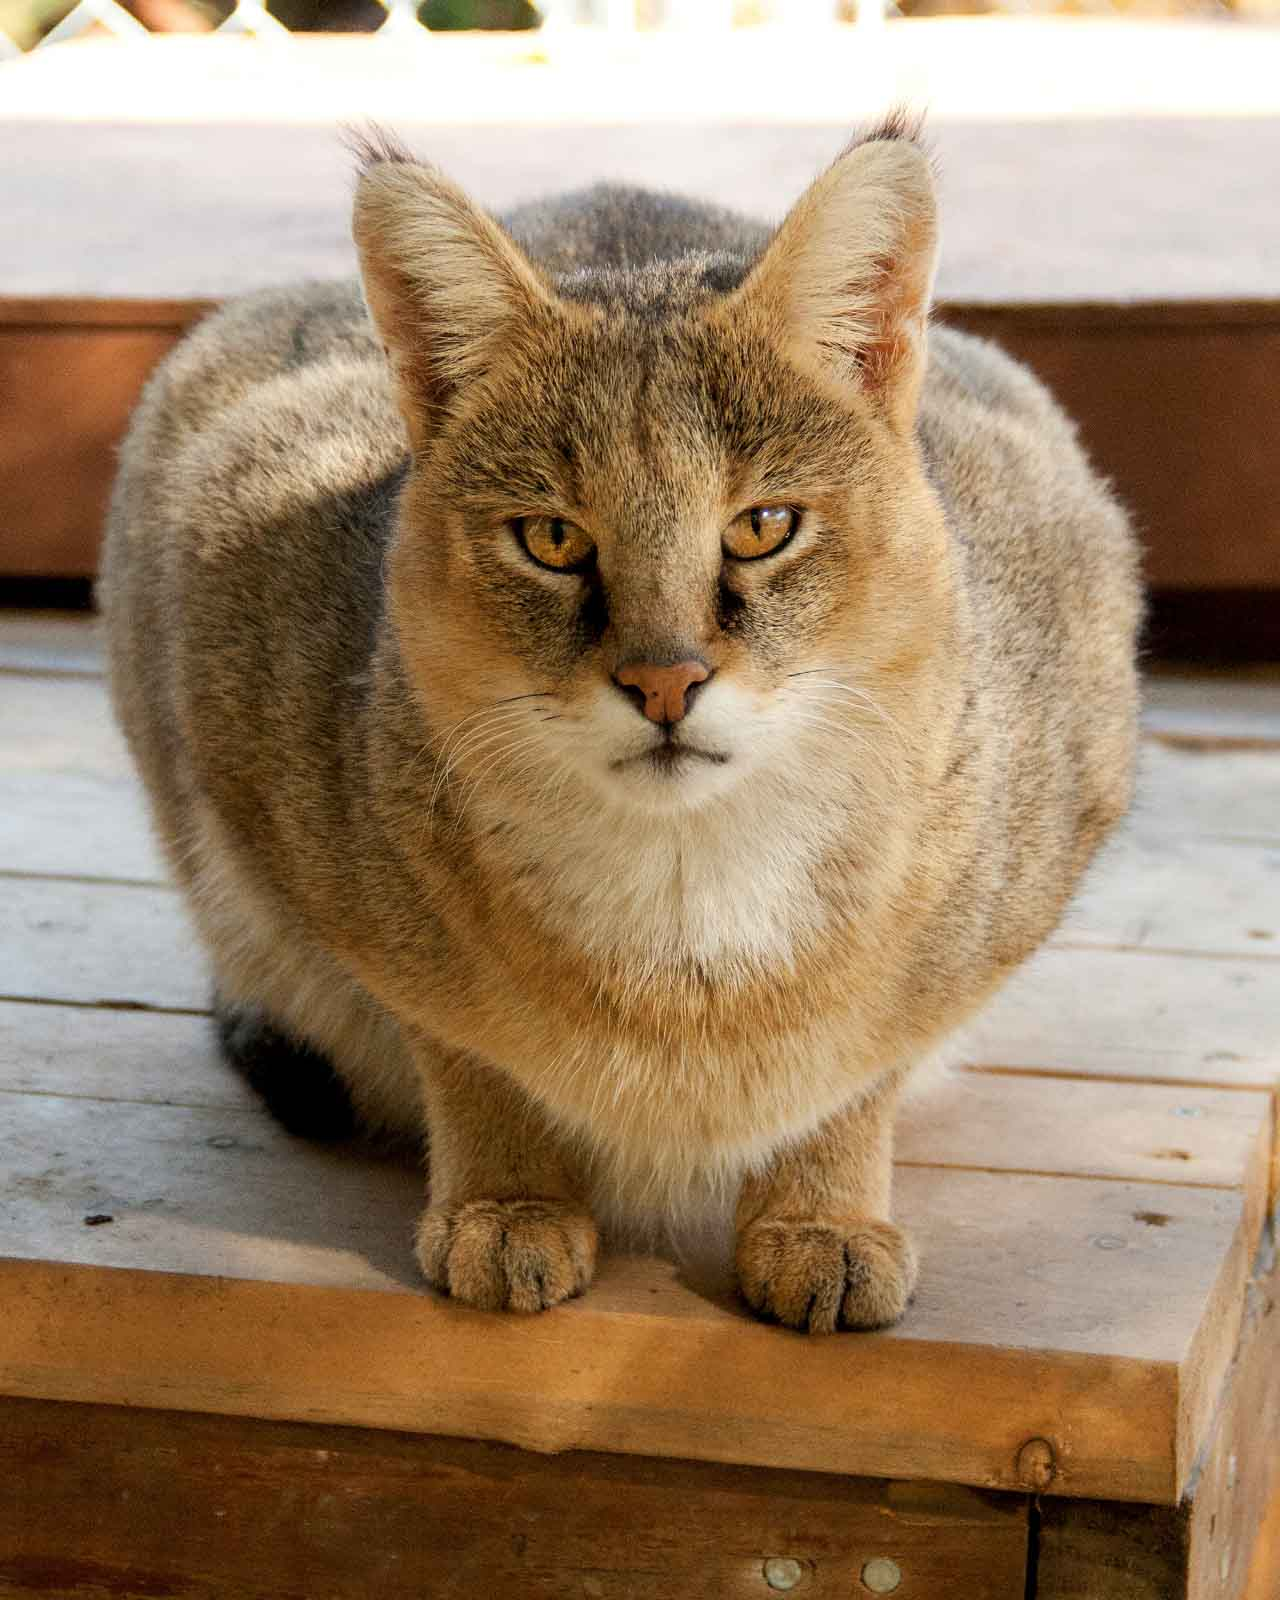 Чаузи (chausie): фото и описание породы кошек (характер, уход и кормление)